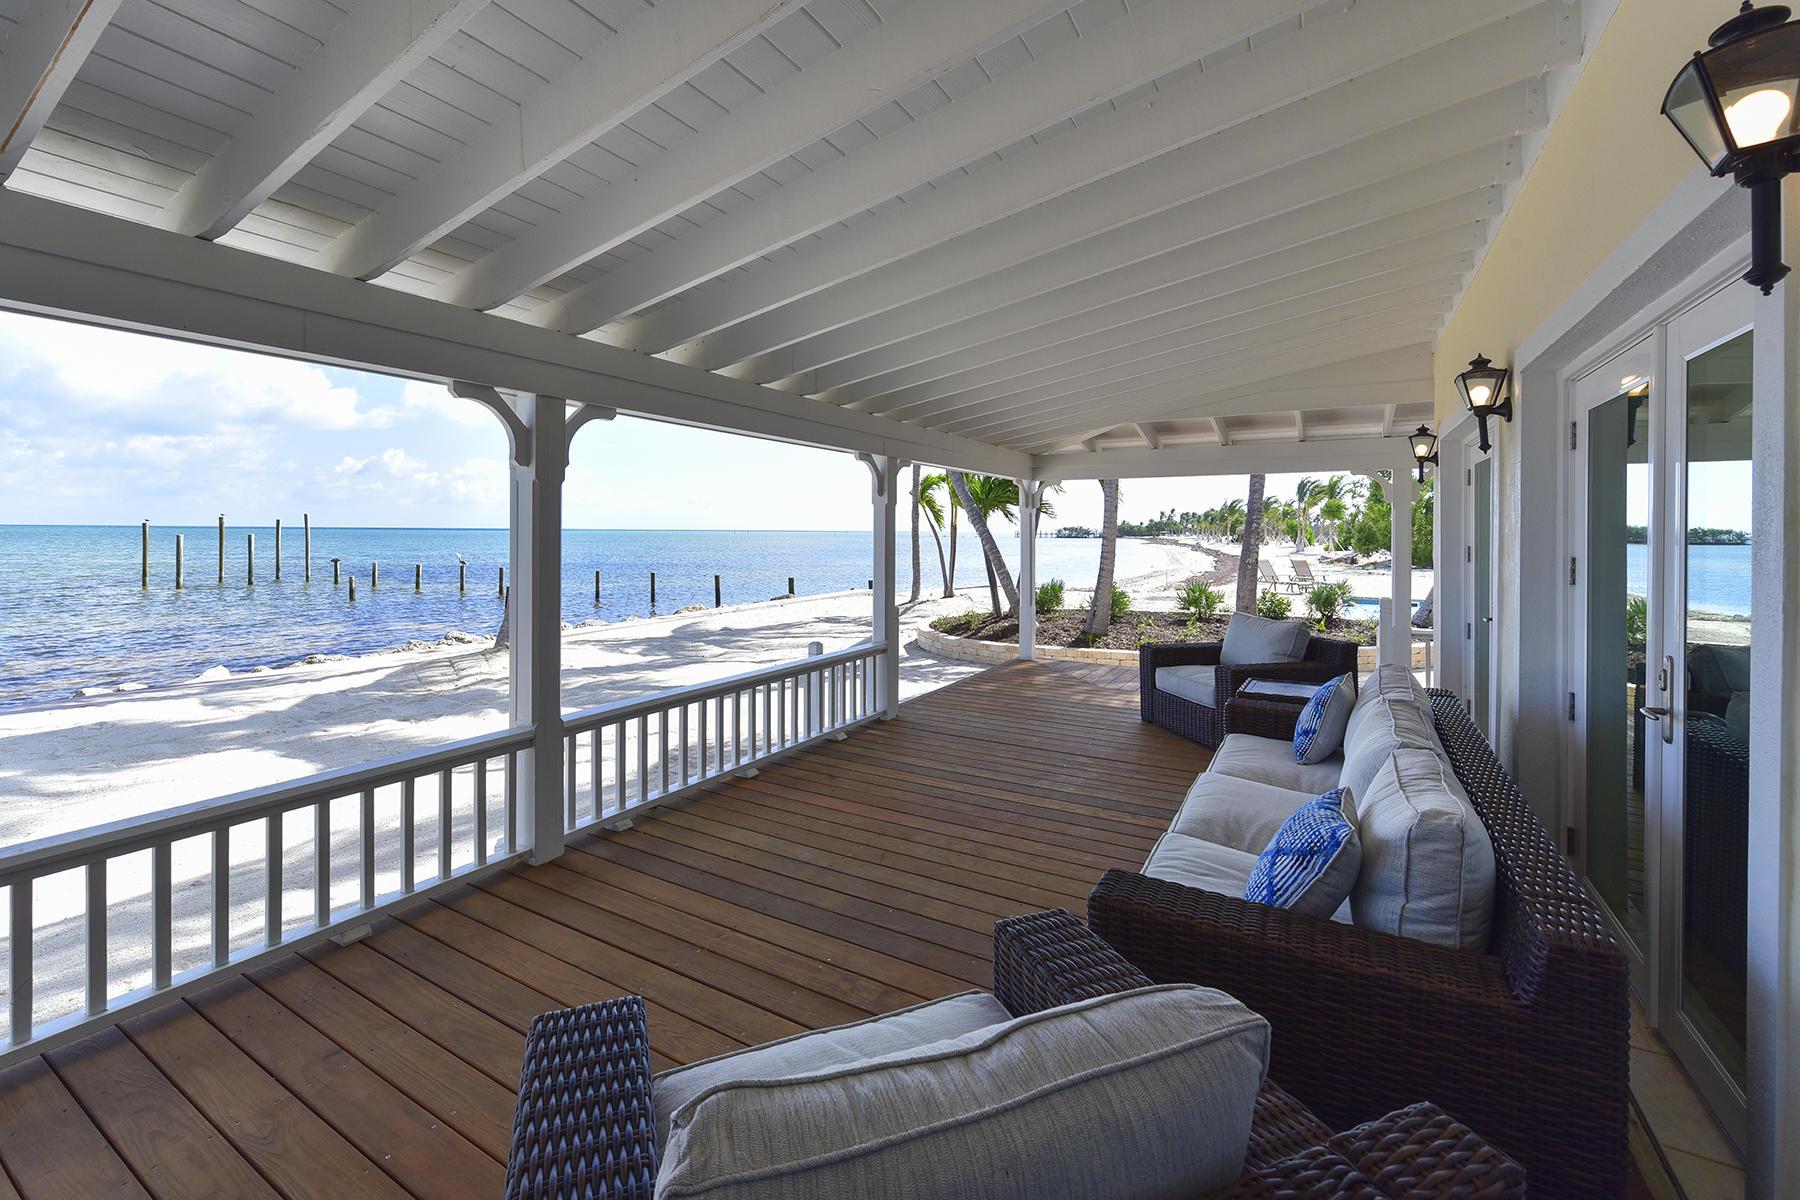 Single Family Homes für Verkauf beim 77001 Overseas Highway, Islamorada, FL Islamorada, Florida 33036 Vereinigte Staaten